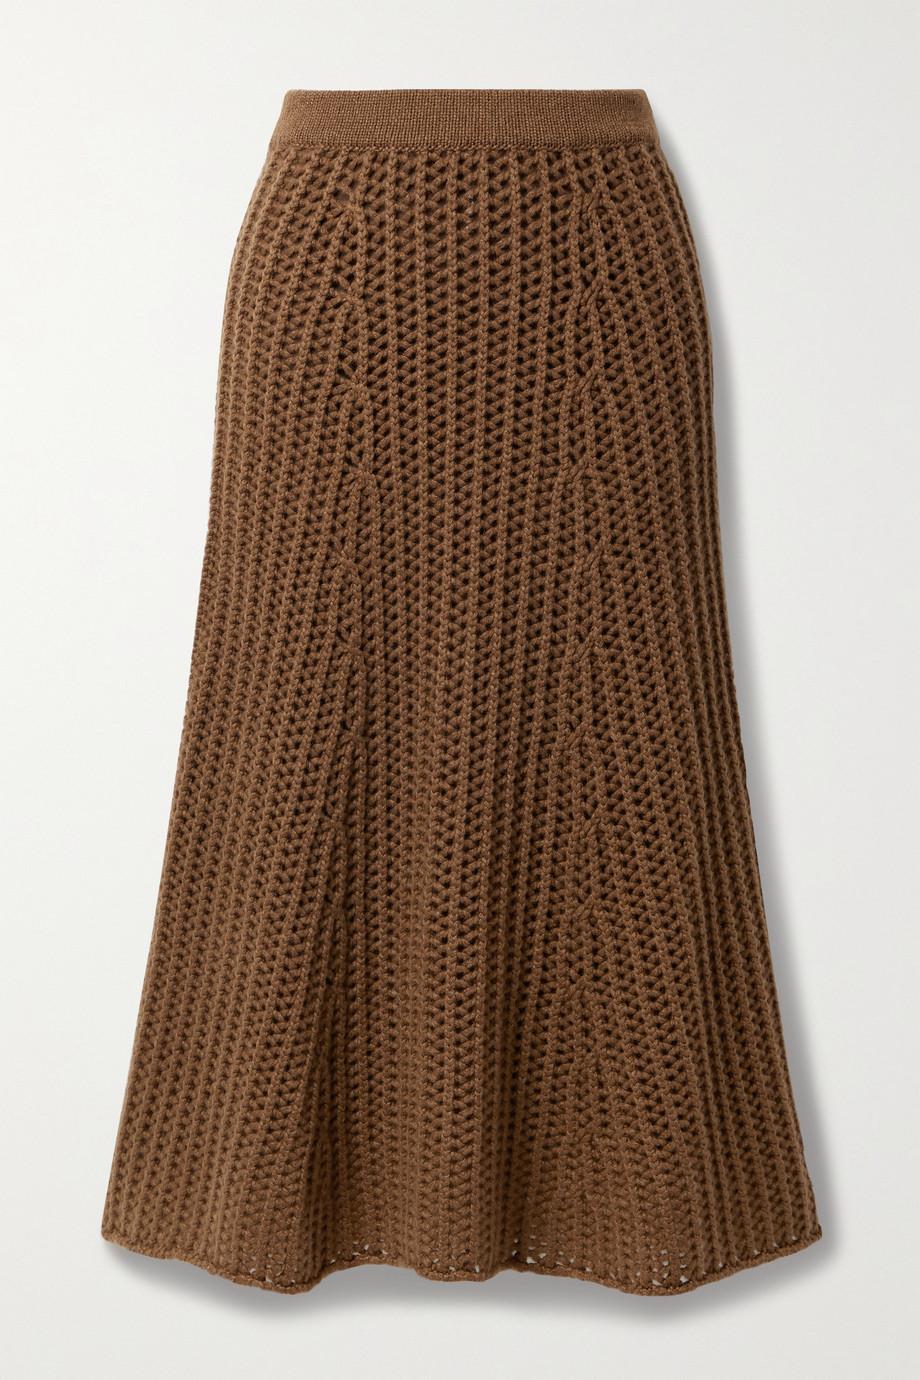 Gabriela Hearst Pablo cashmere midi skirt